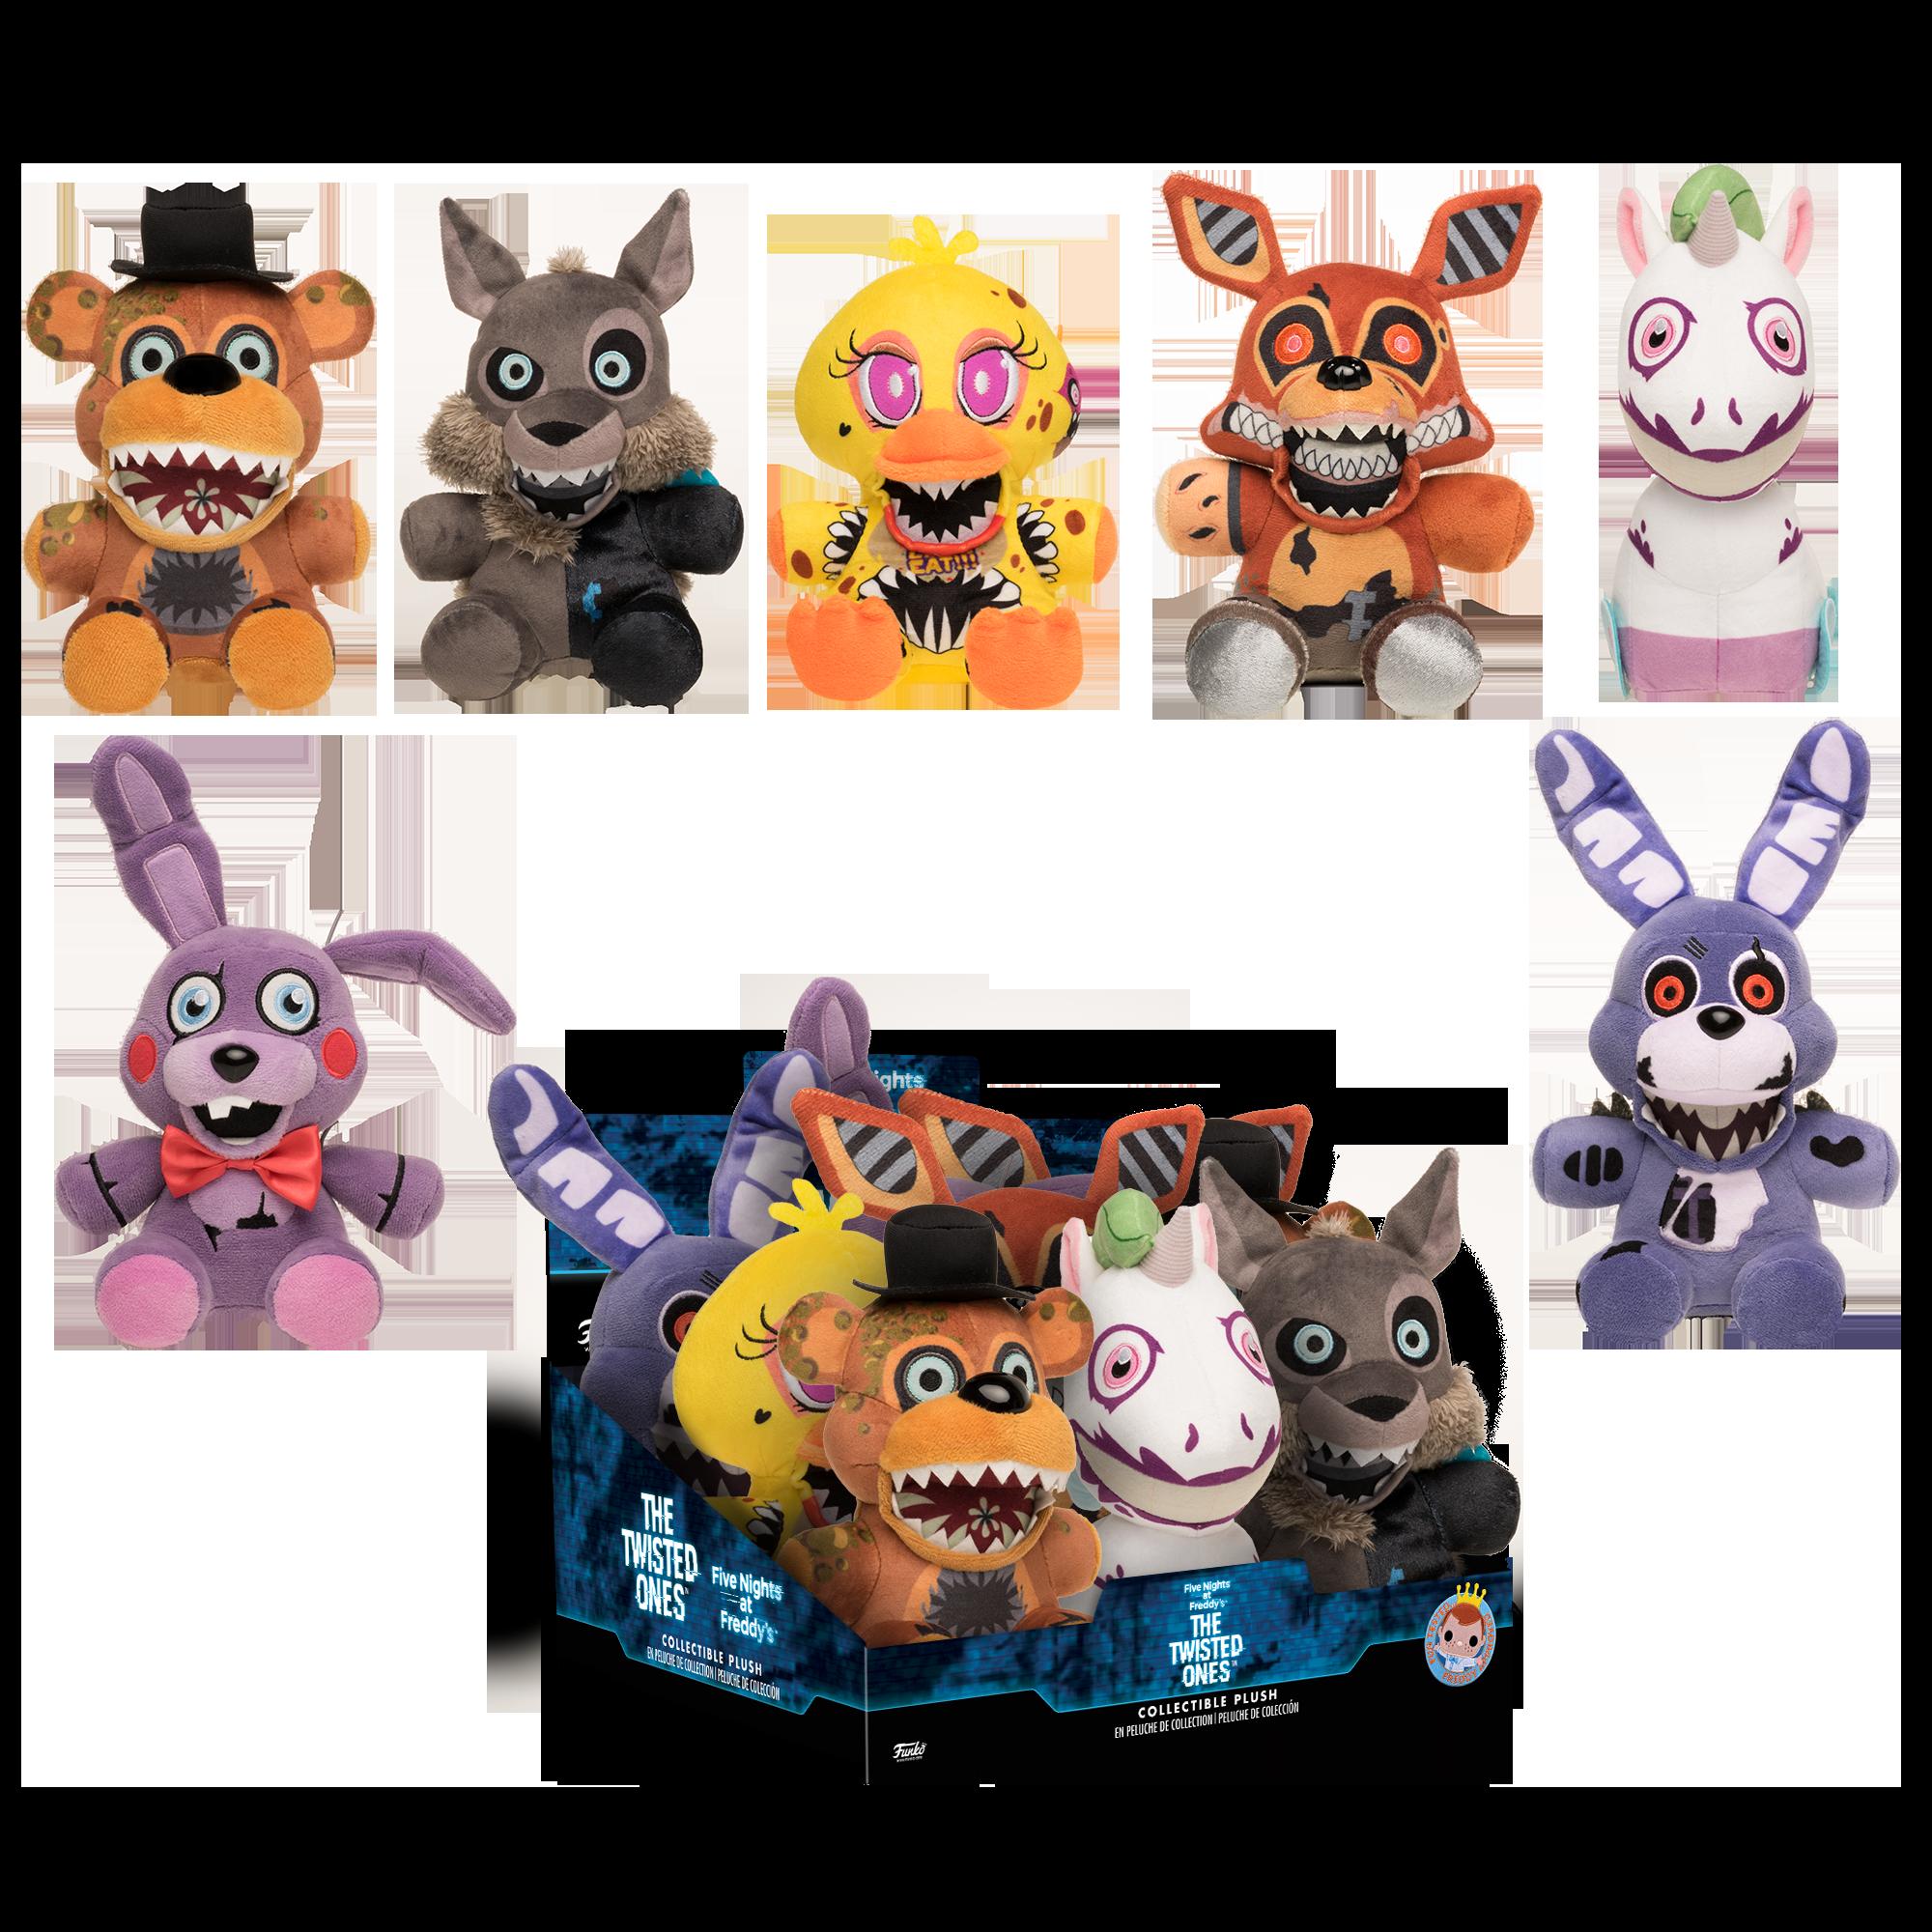 Koala Stuffed Animals Mini, Five Nights At Freddy S The Twisted Ones Plush Assortment Gamestop